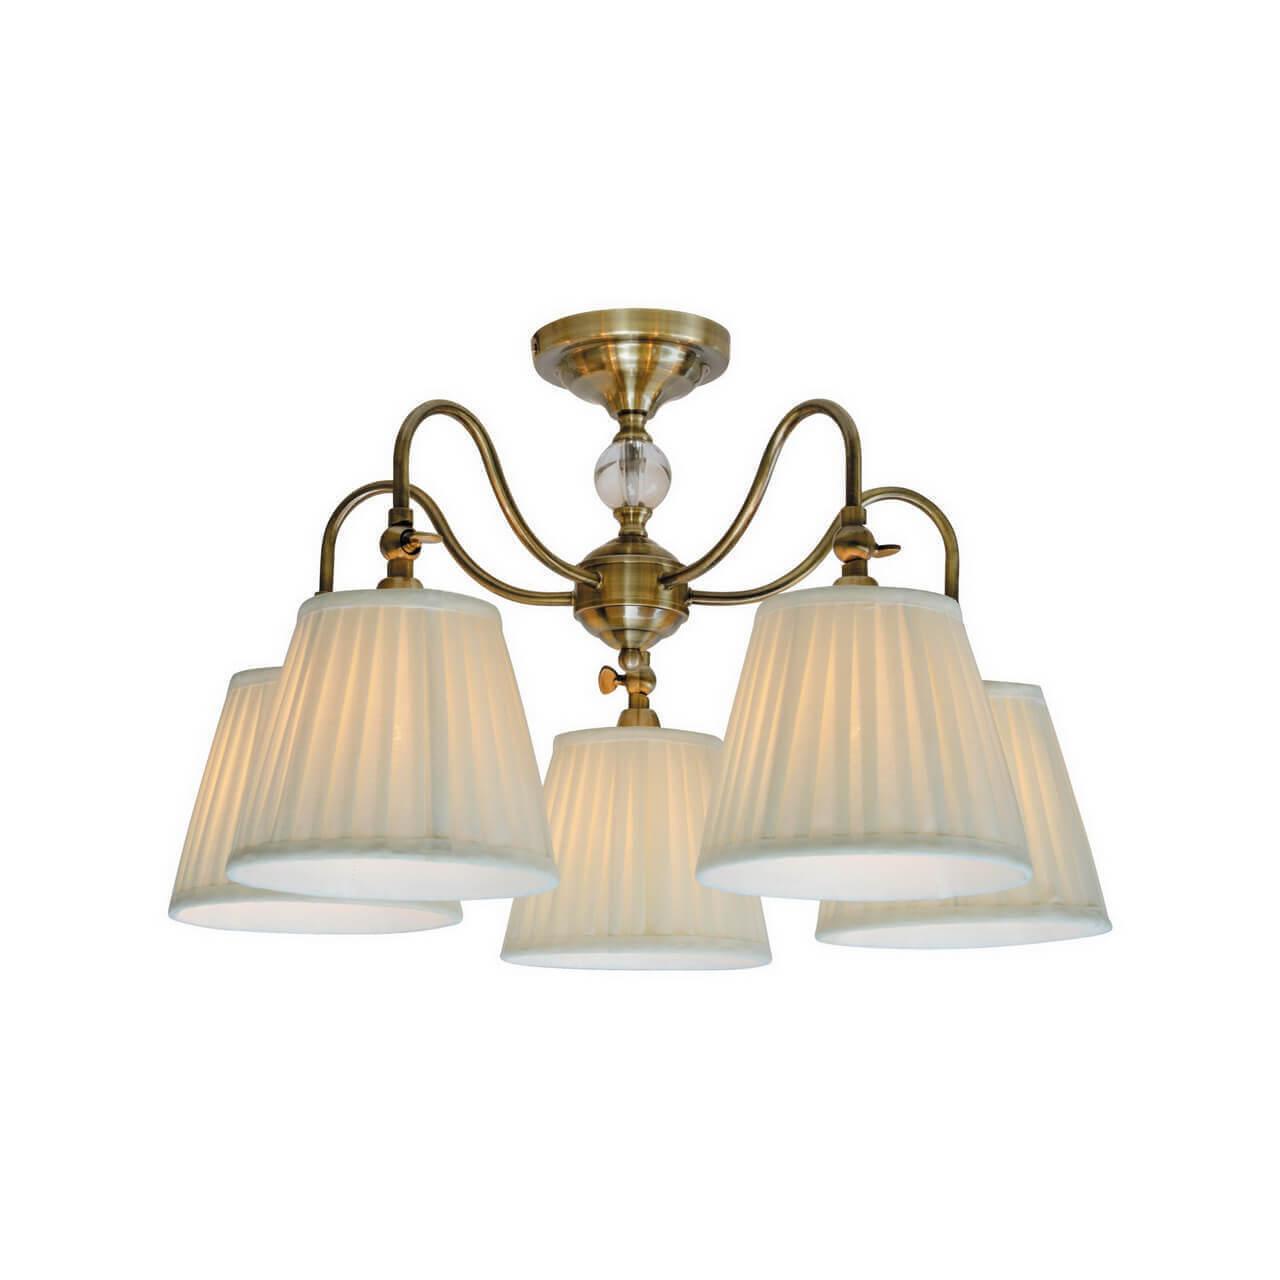 Люстра Arte Lamp A1509PL-5PB Seville